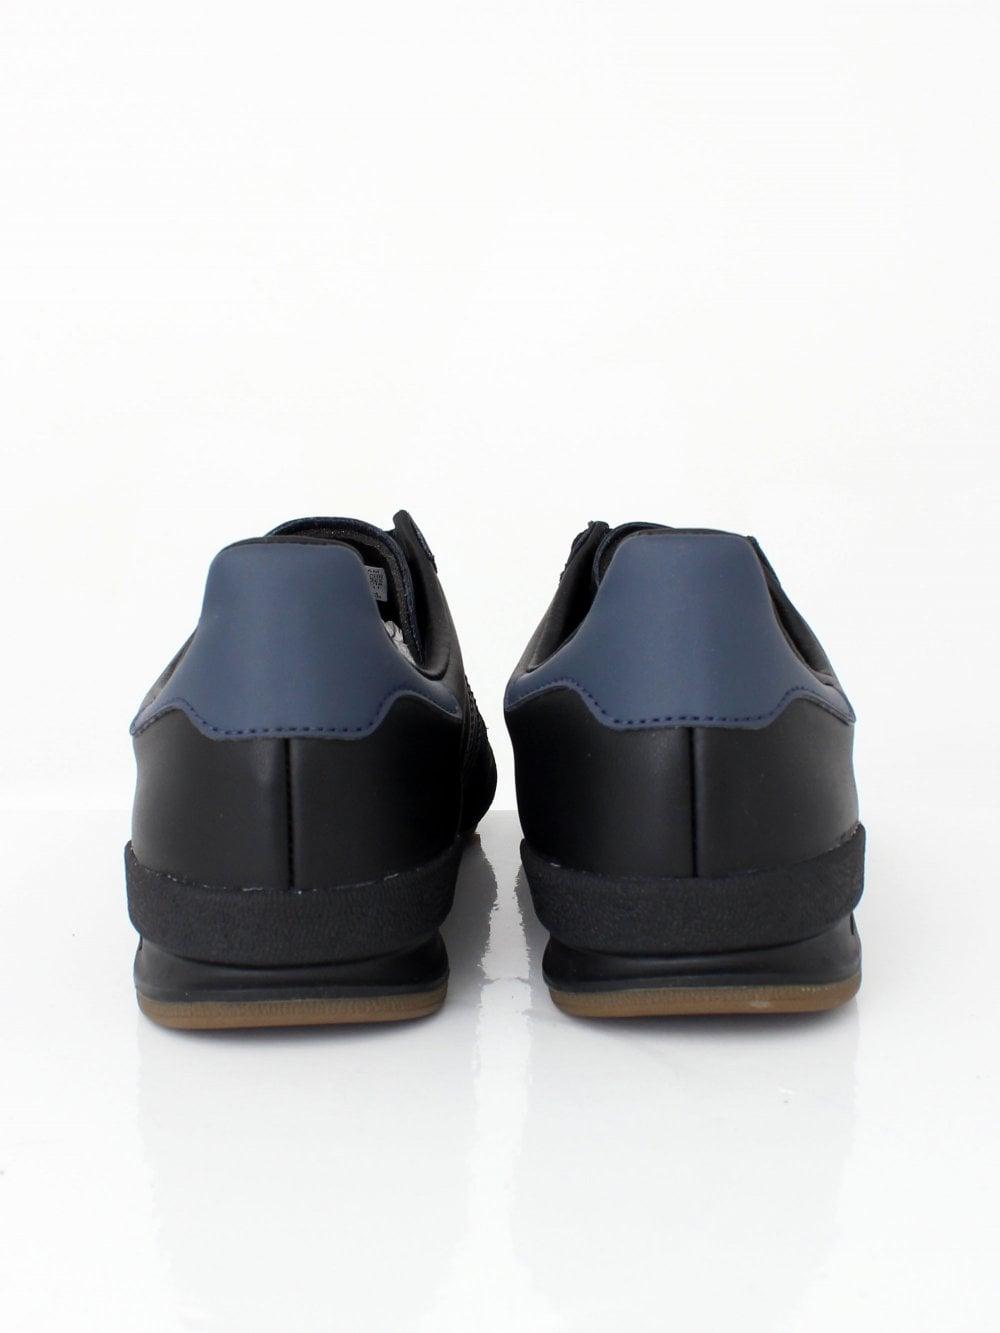 Adidas Jeans in Black Navy 2fe8c6db74bd